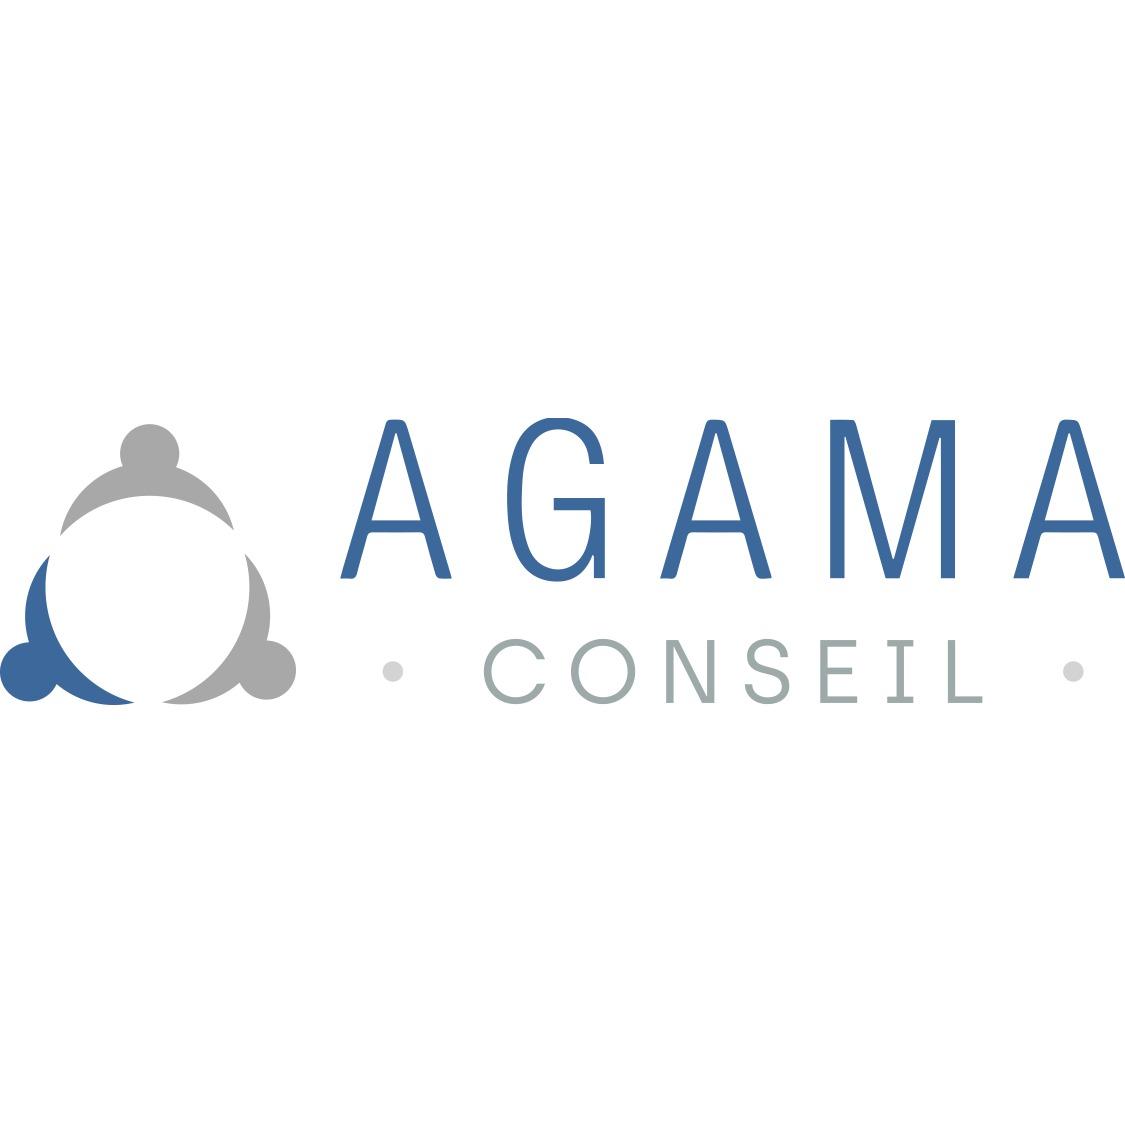 the Agama Conseil logo.